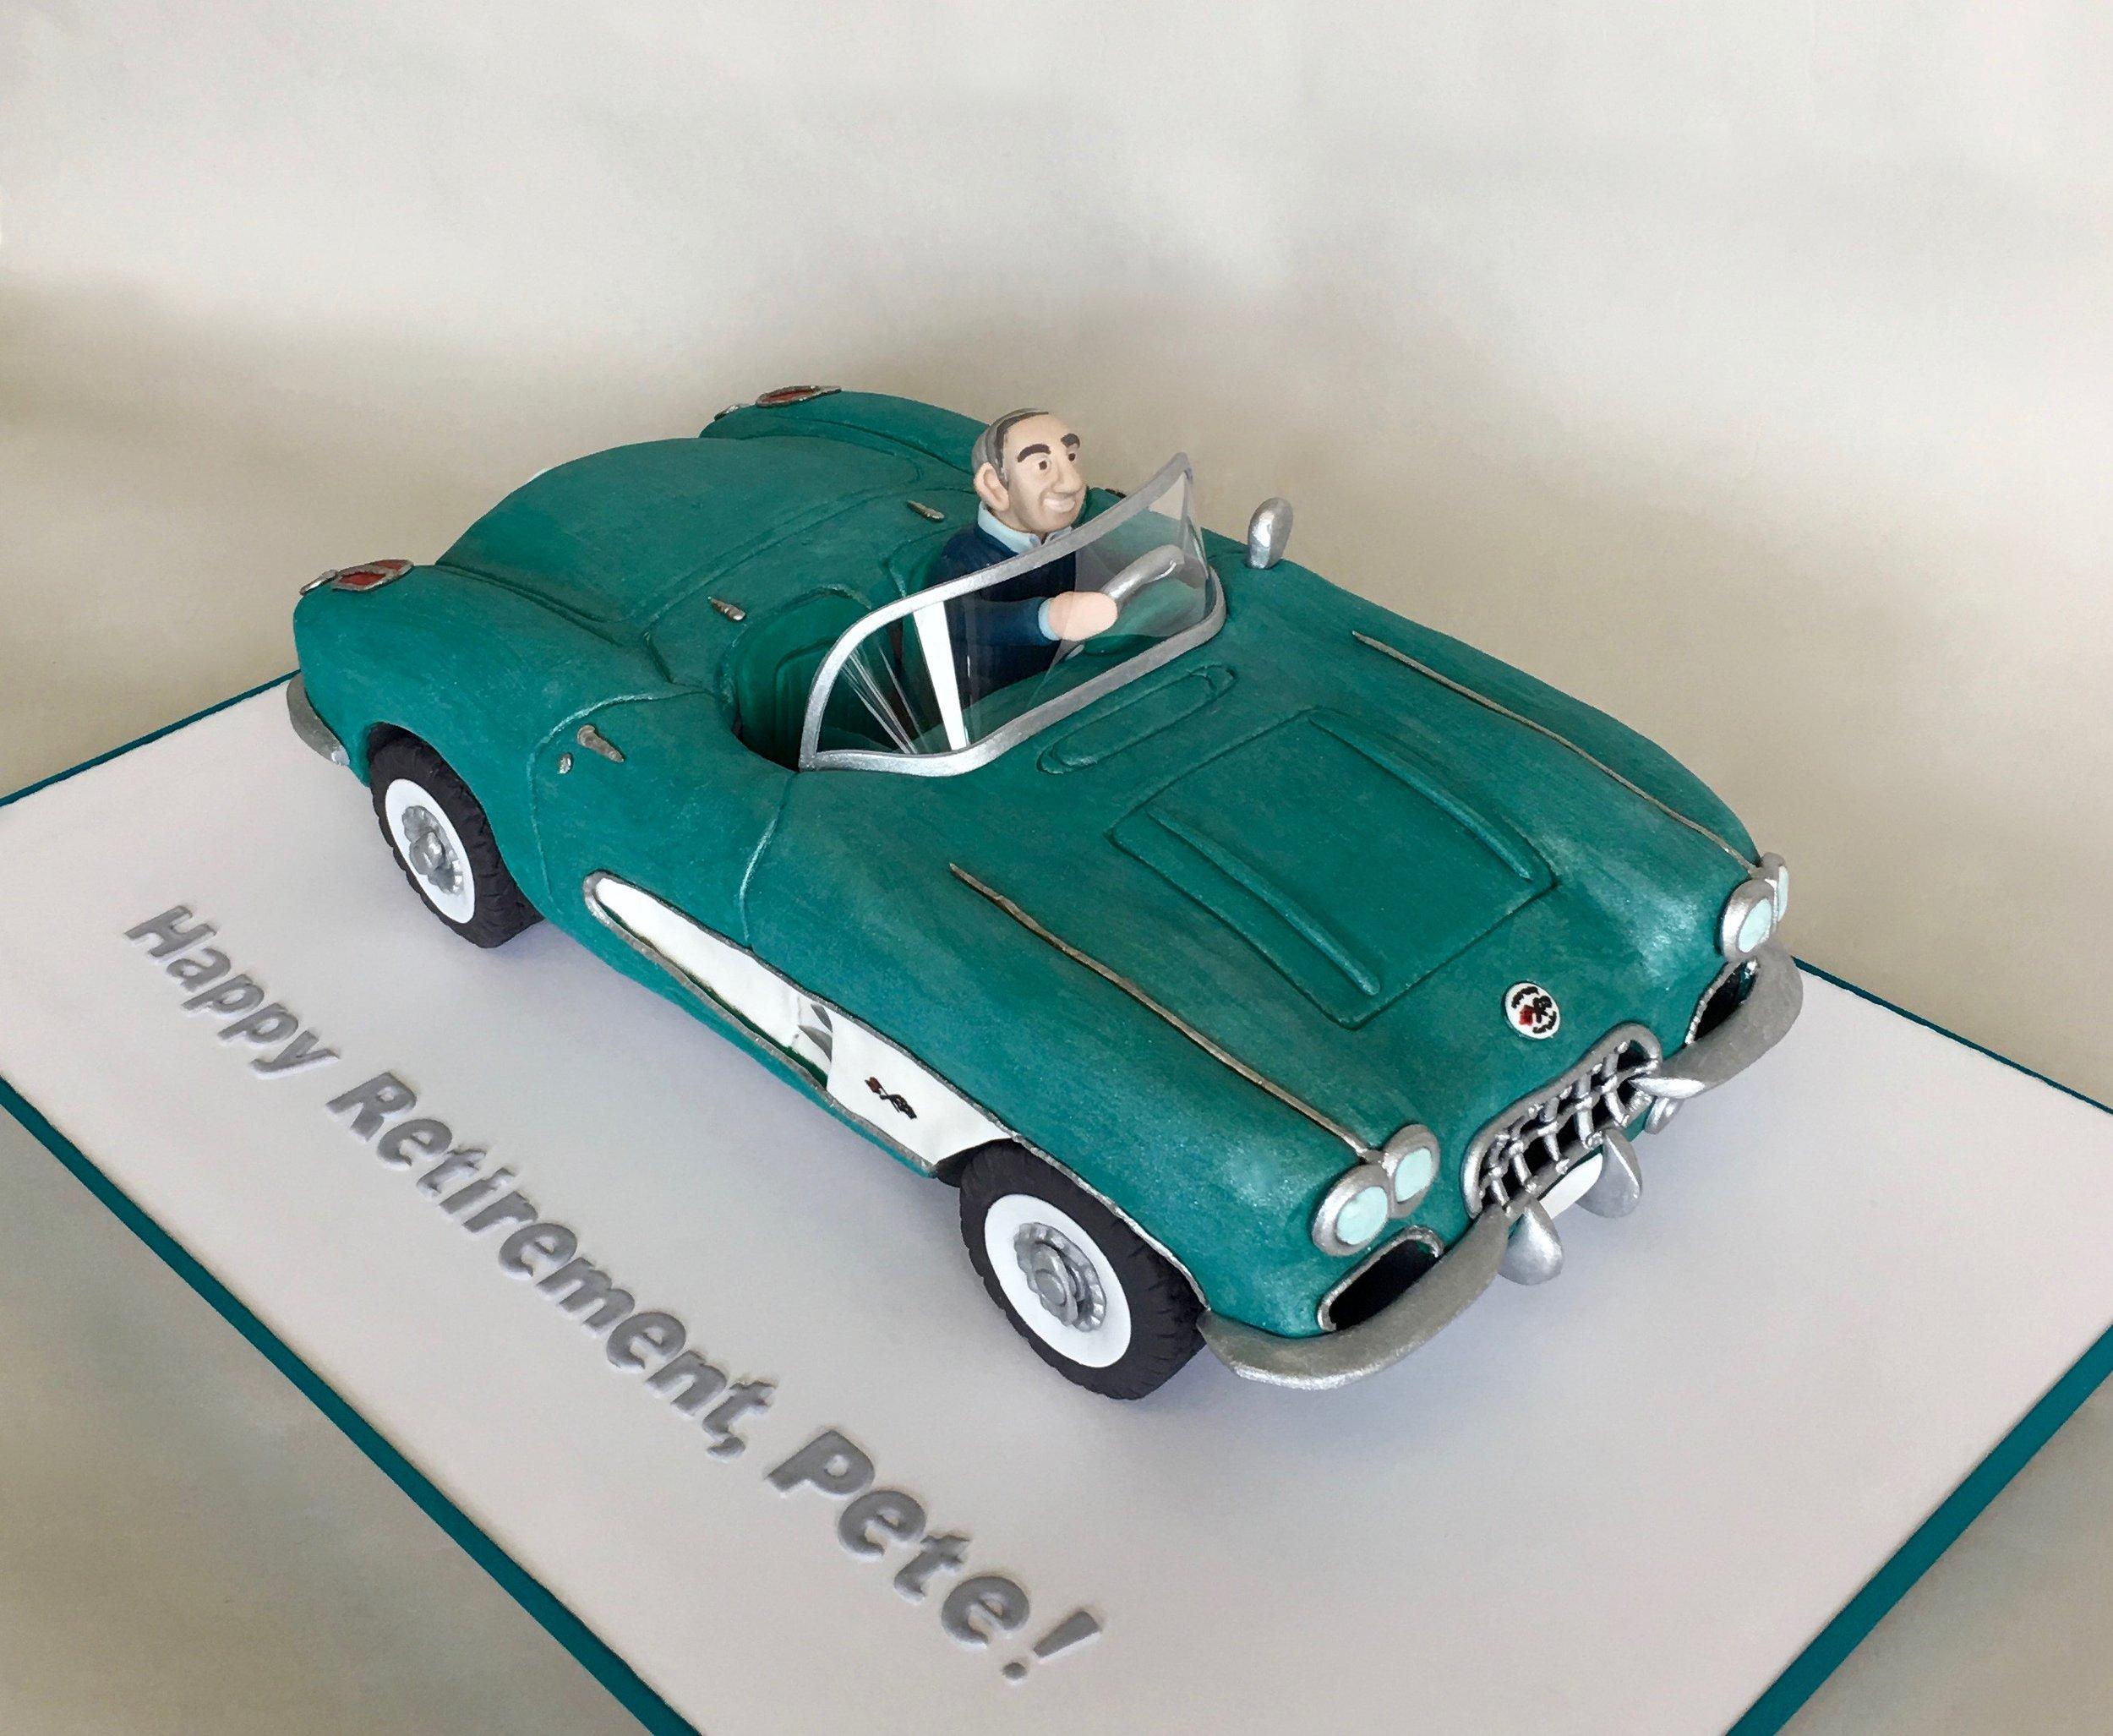 Novelty Sculpted Cakes Honey Crumb Cake Studio Seattle Bakery Custom Cakes Wedding Cakes